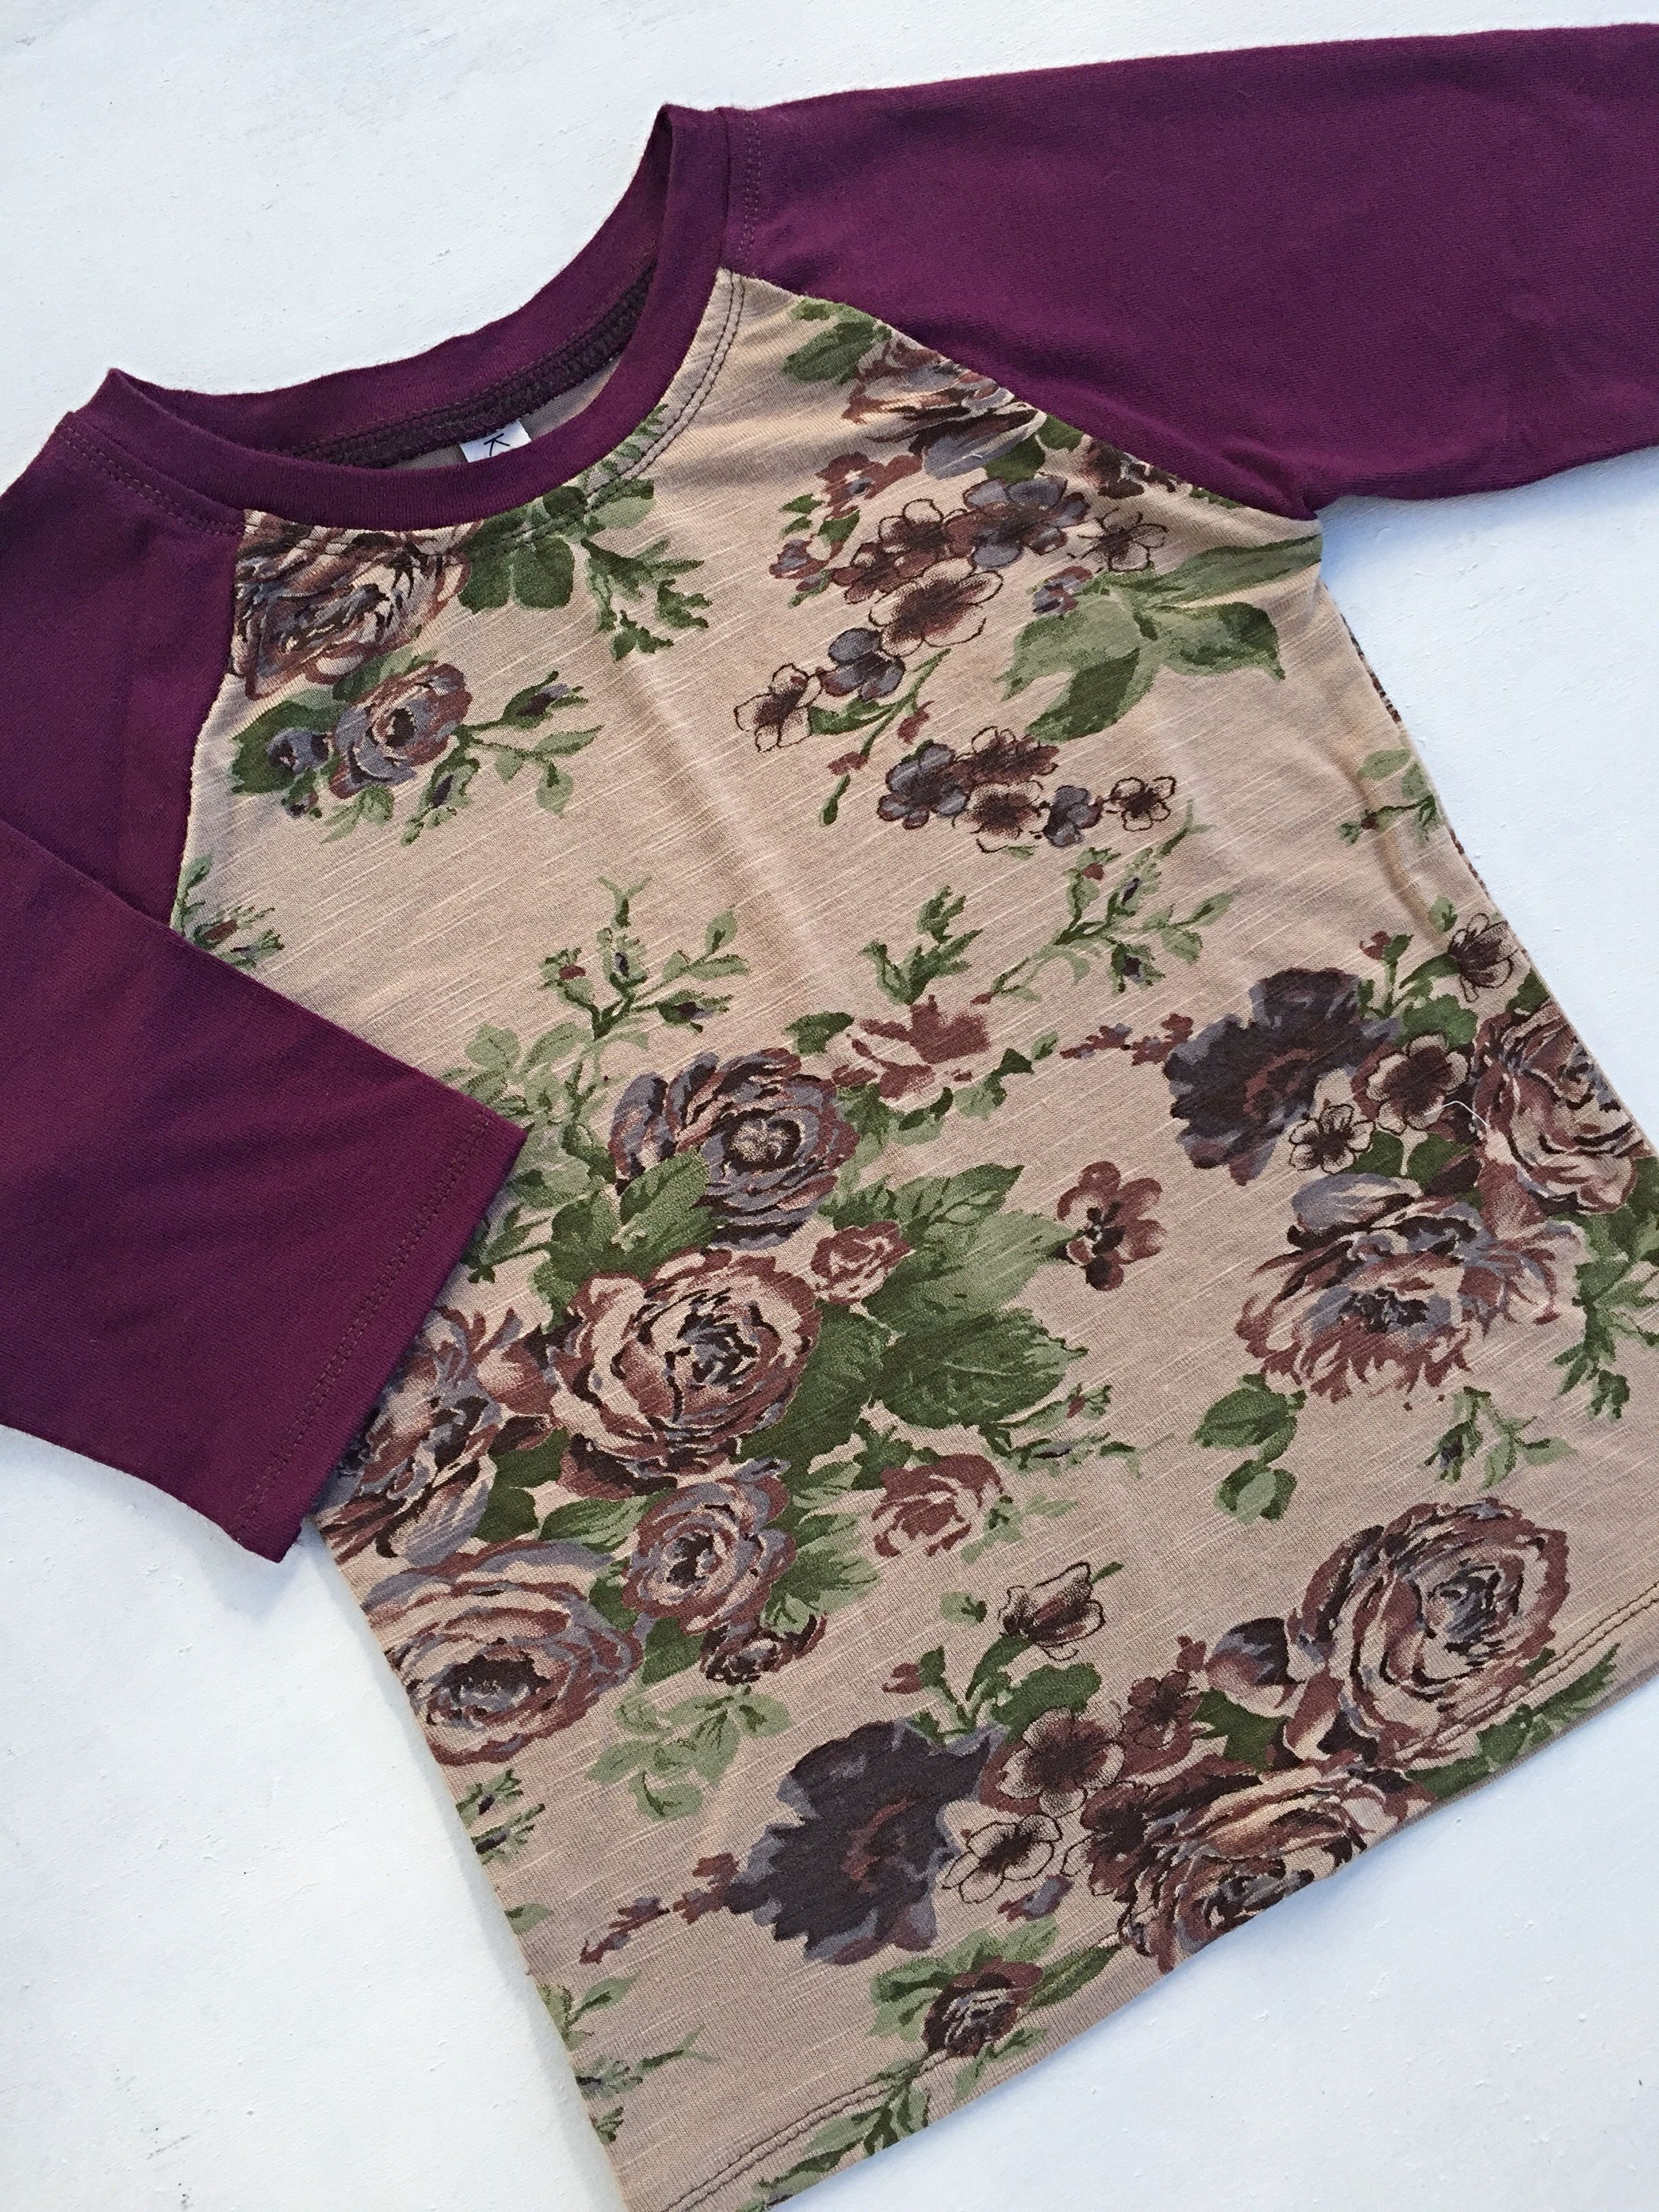 Floral raglan baby shirt cute baby clothes raglan shirt toddler baby